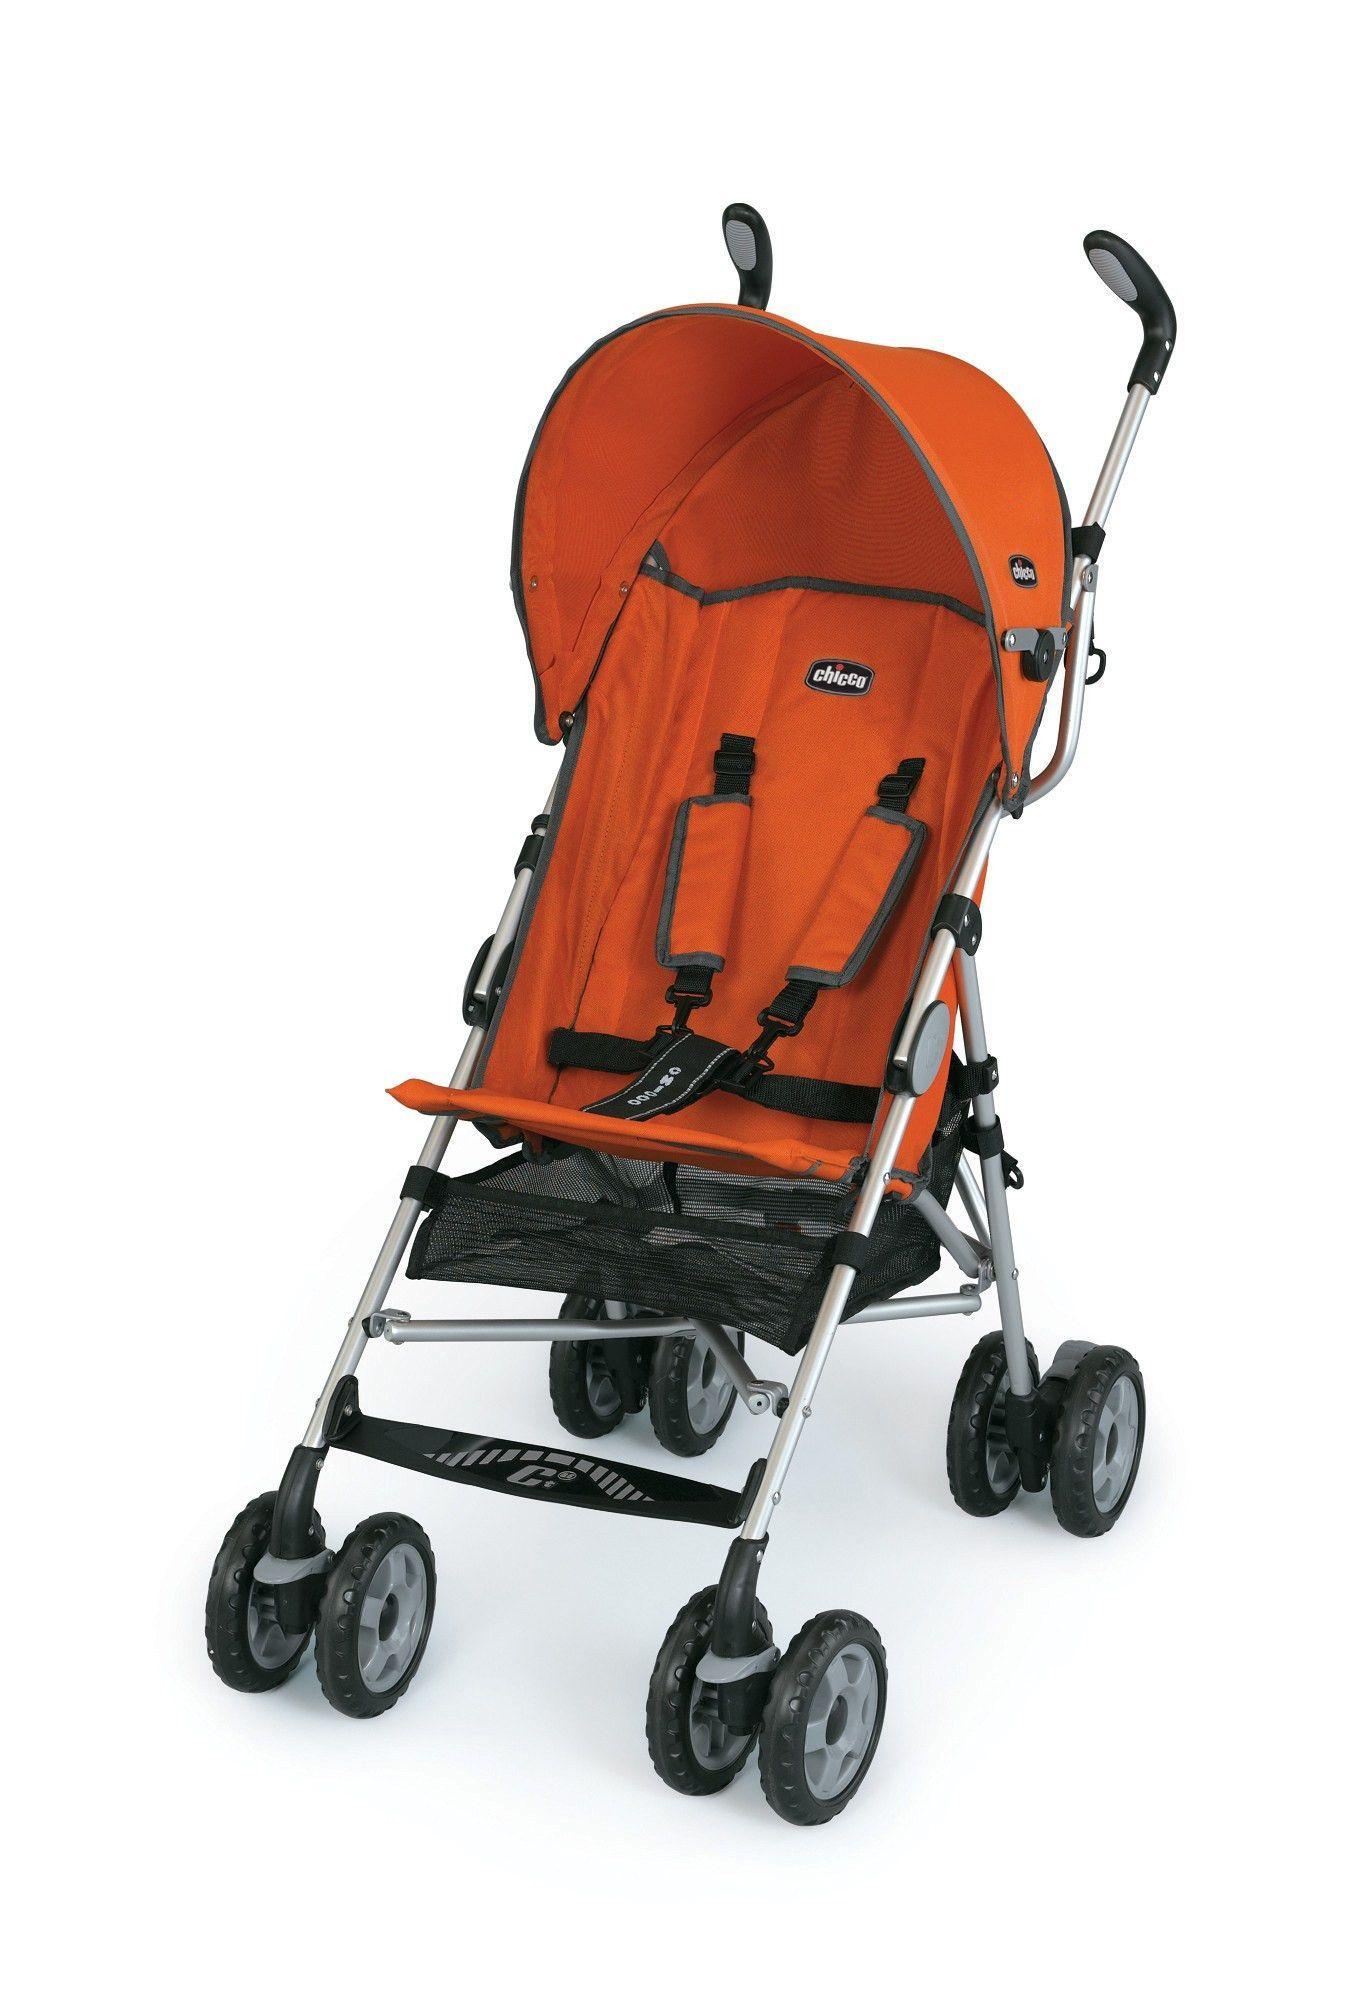 chicco c6 stroller products pinterest. Black Bedroom Furniture Sets. Home Design Ideas